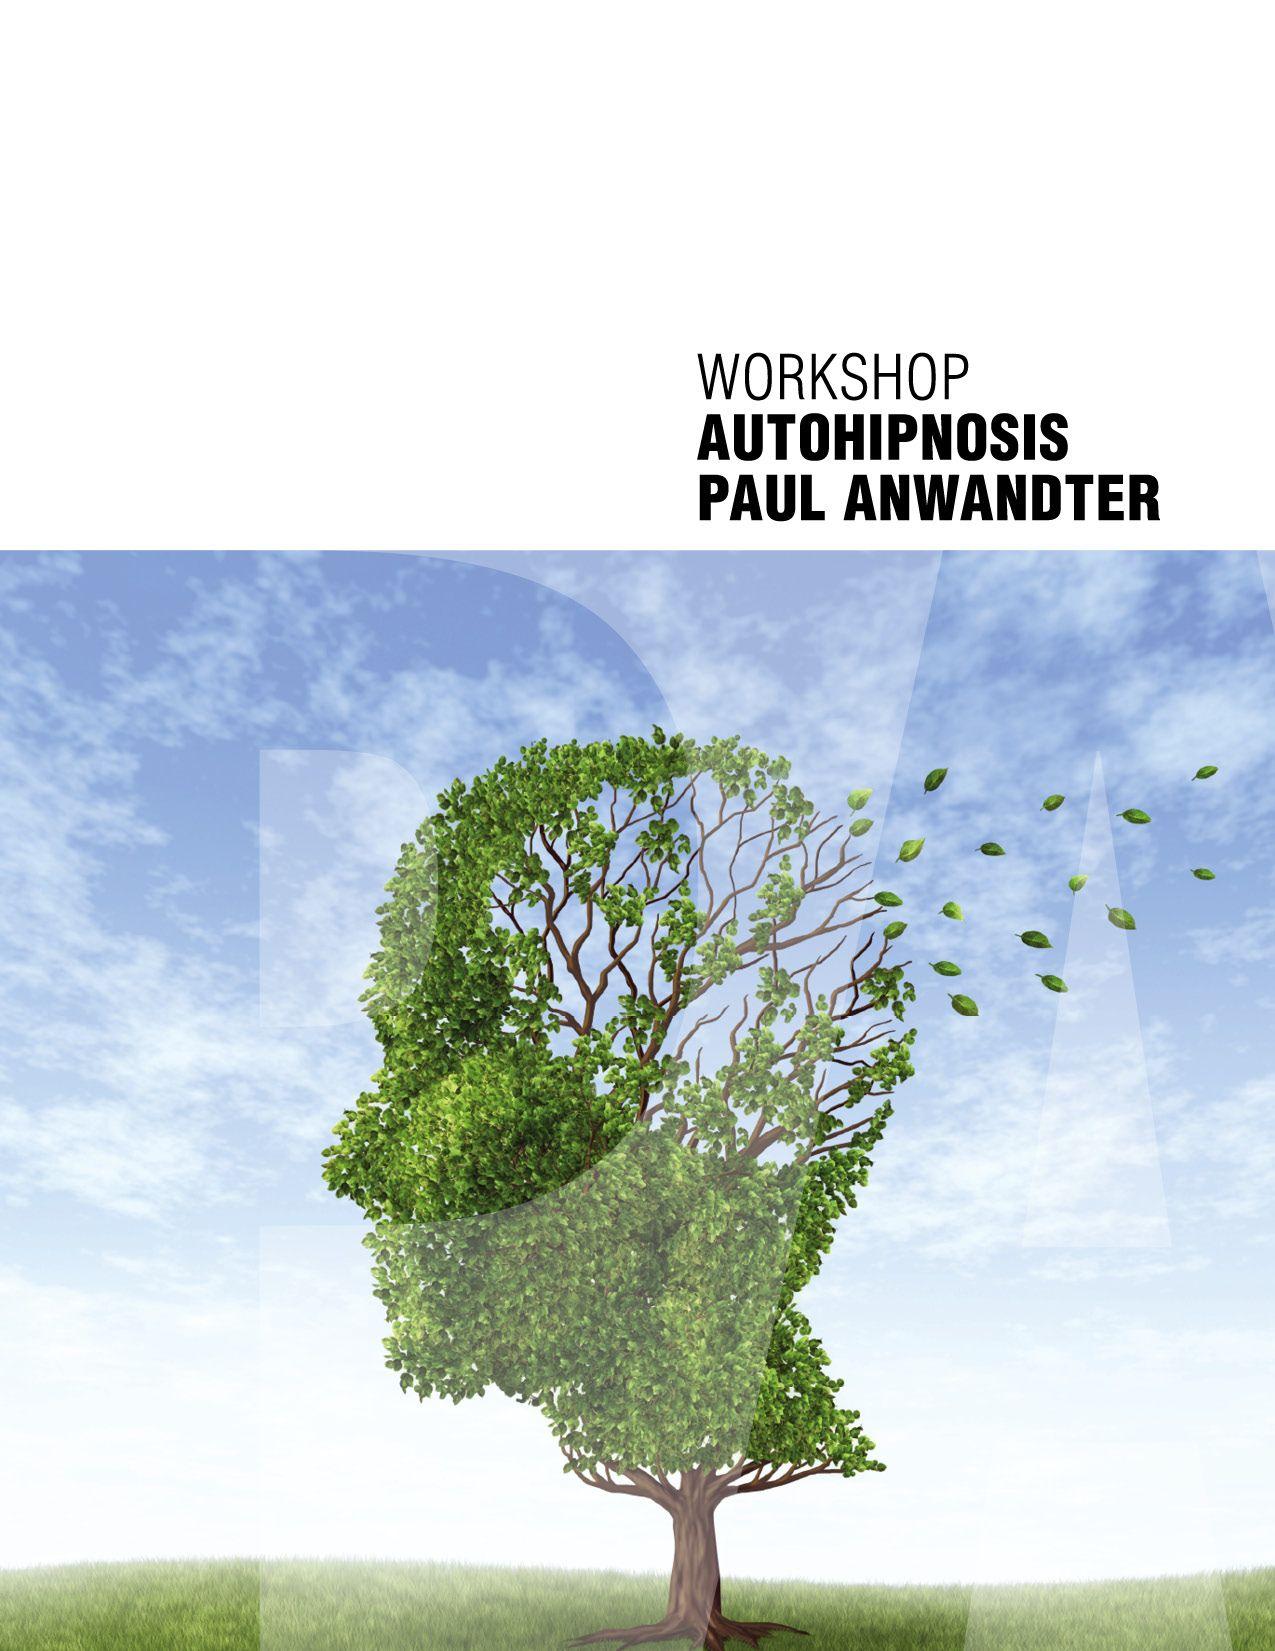 WORKSHOP autohipnosis Paul anwandter